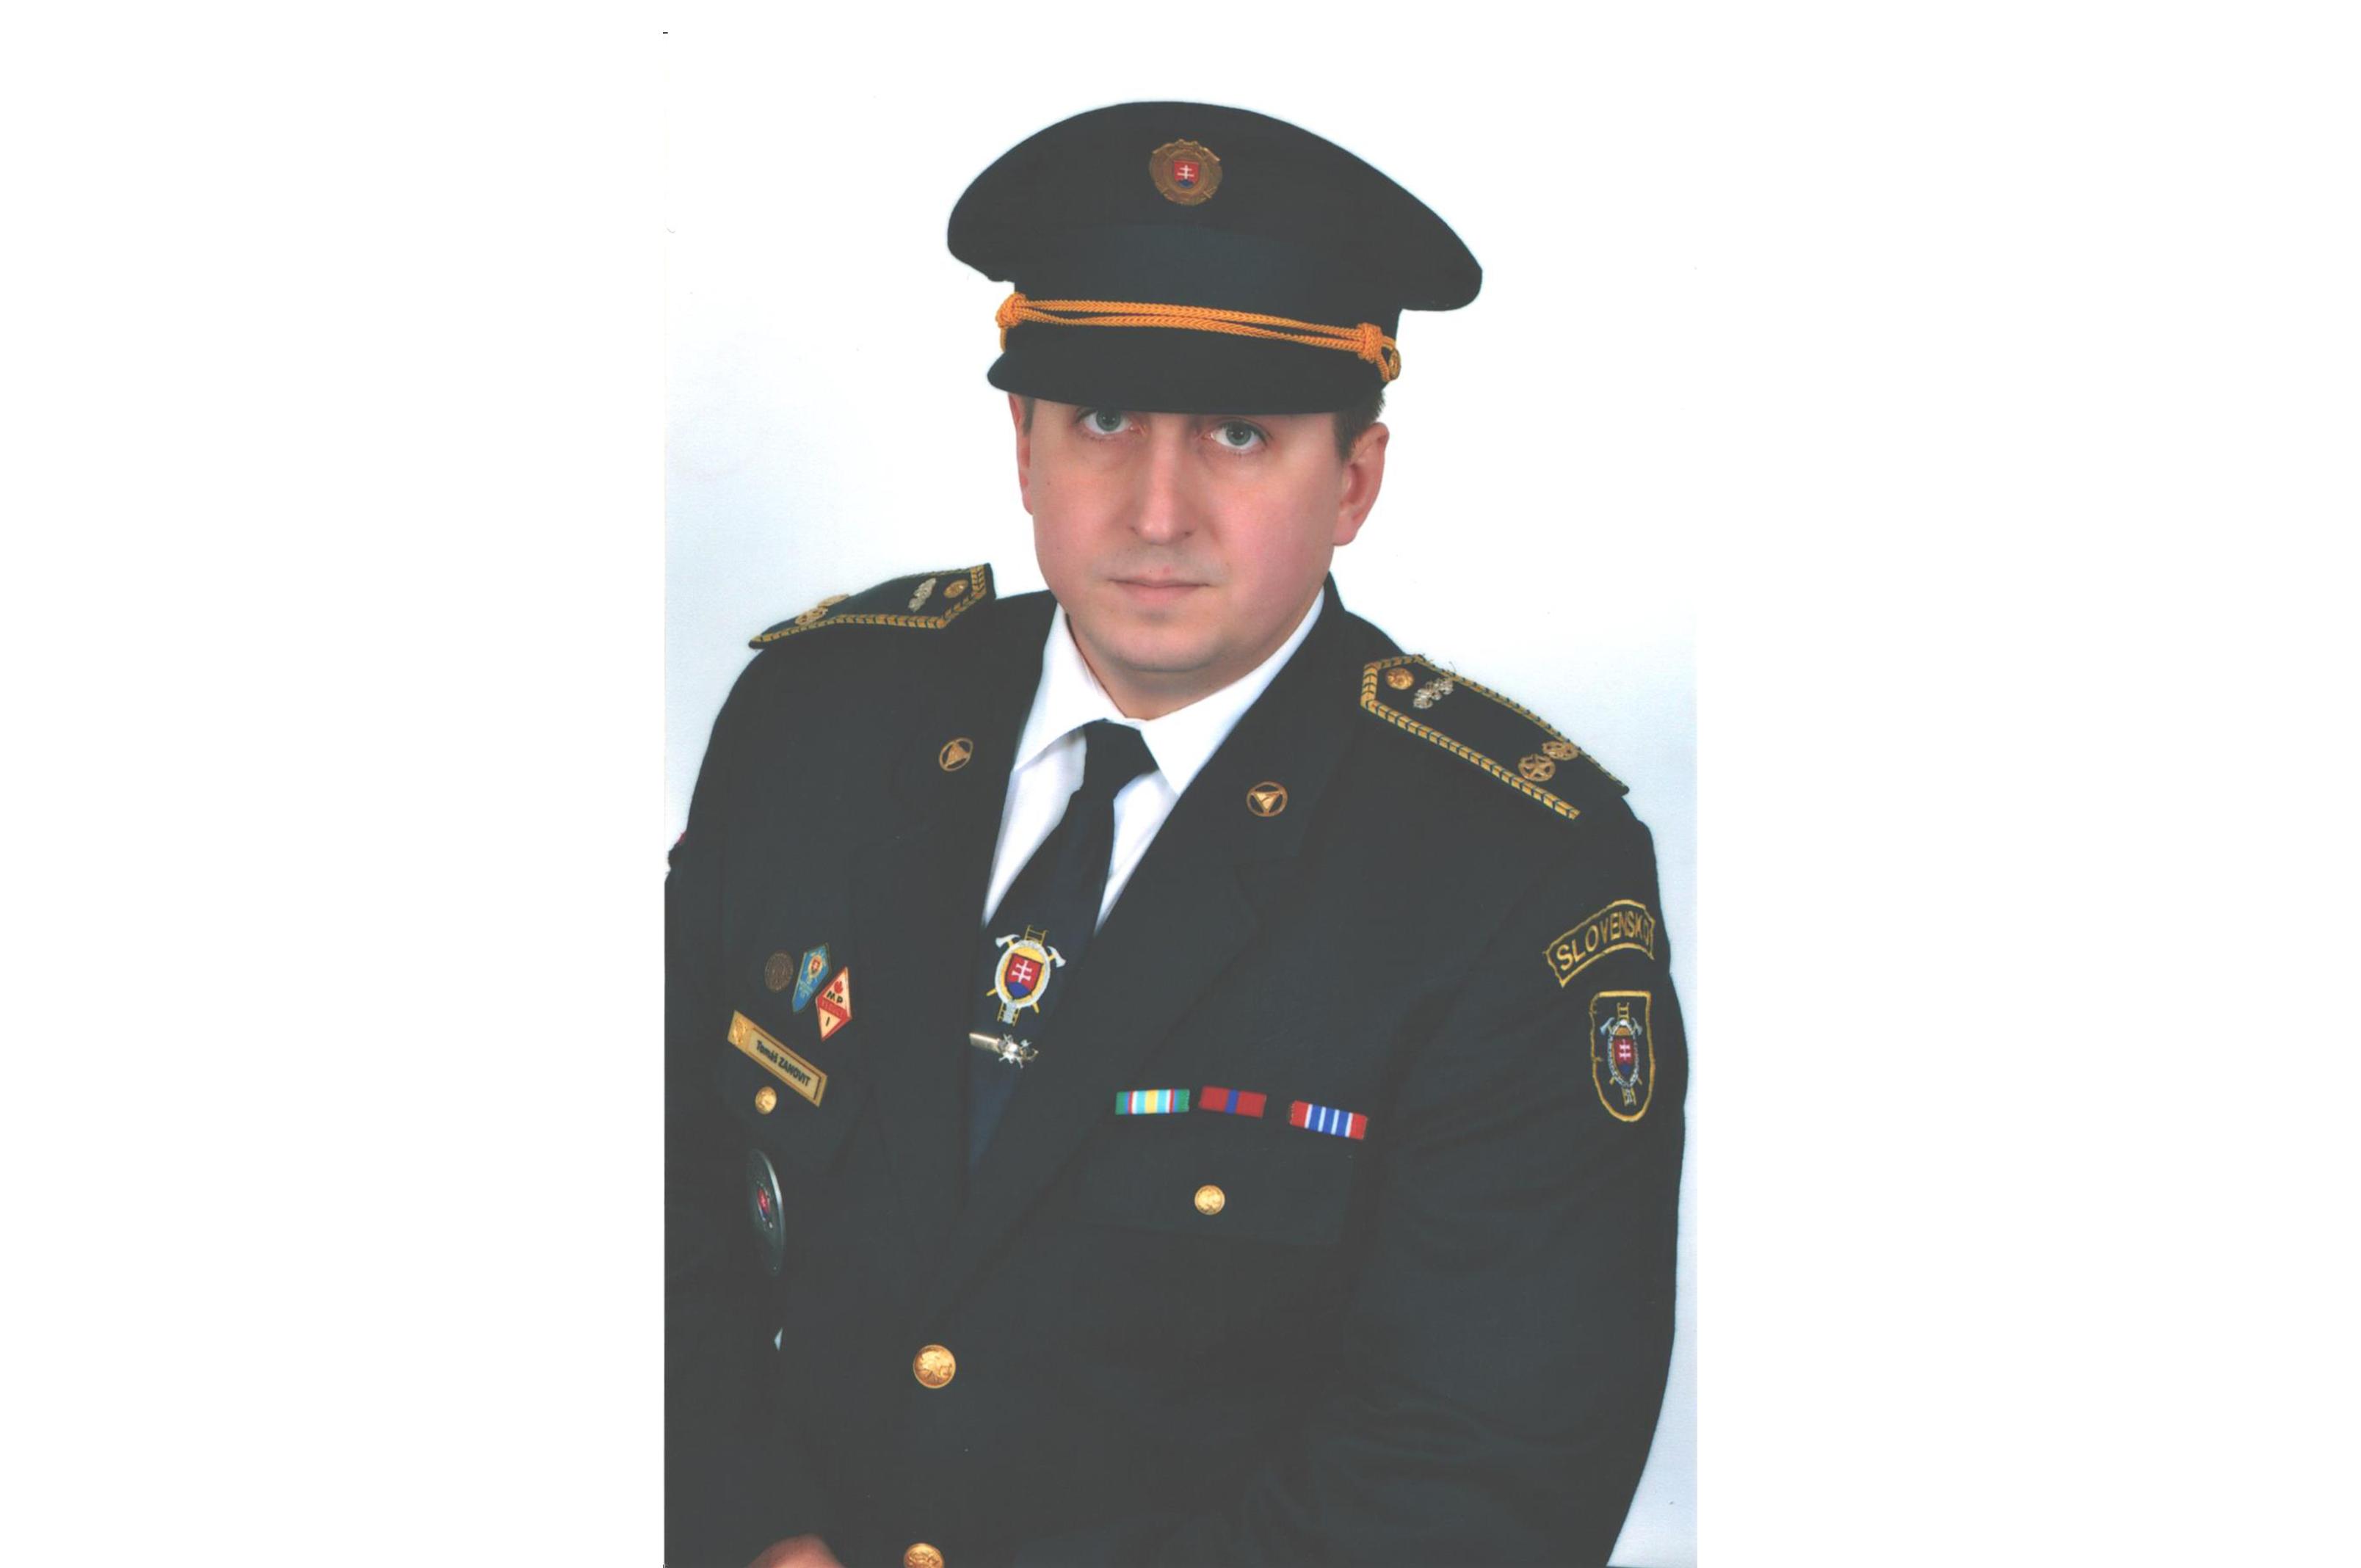 PaedDr. Tomáš Zanovit